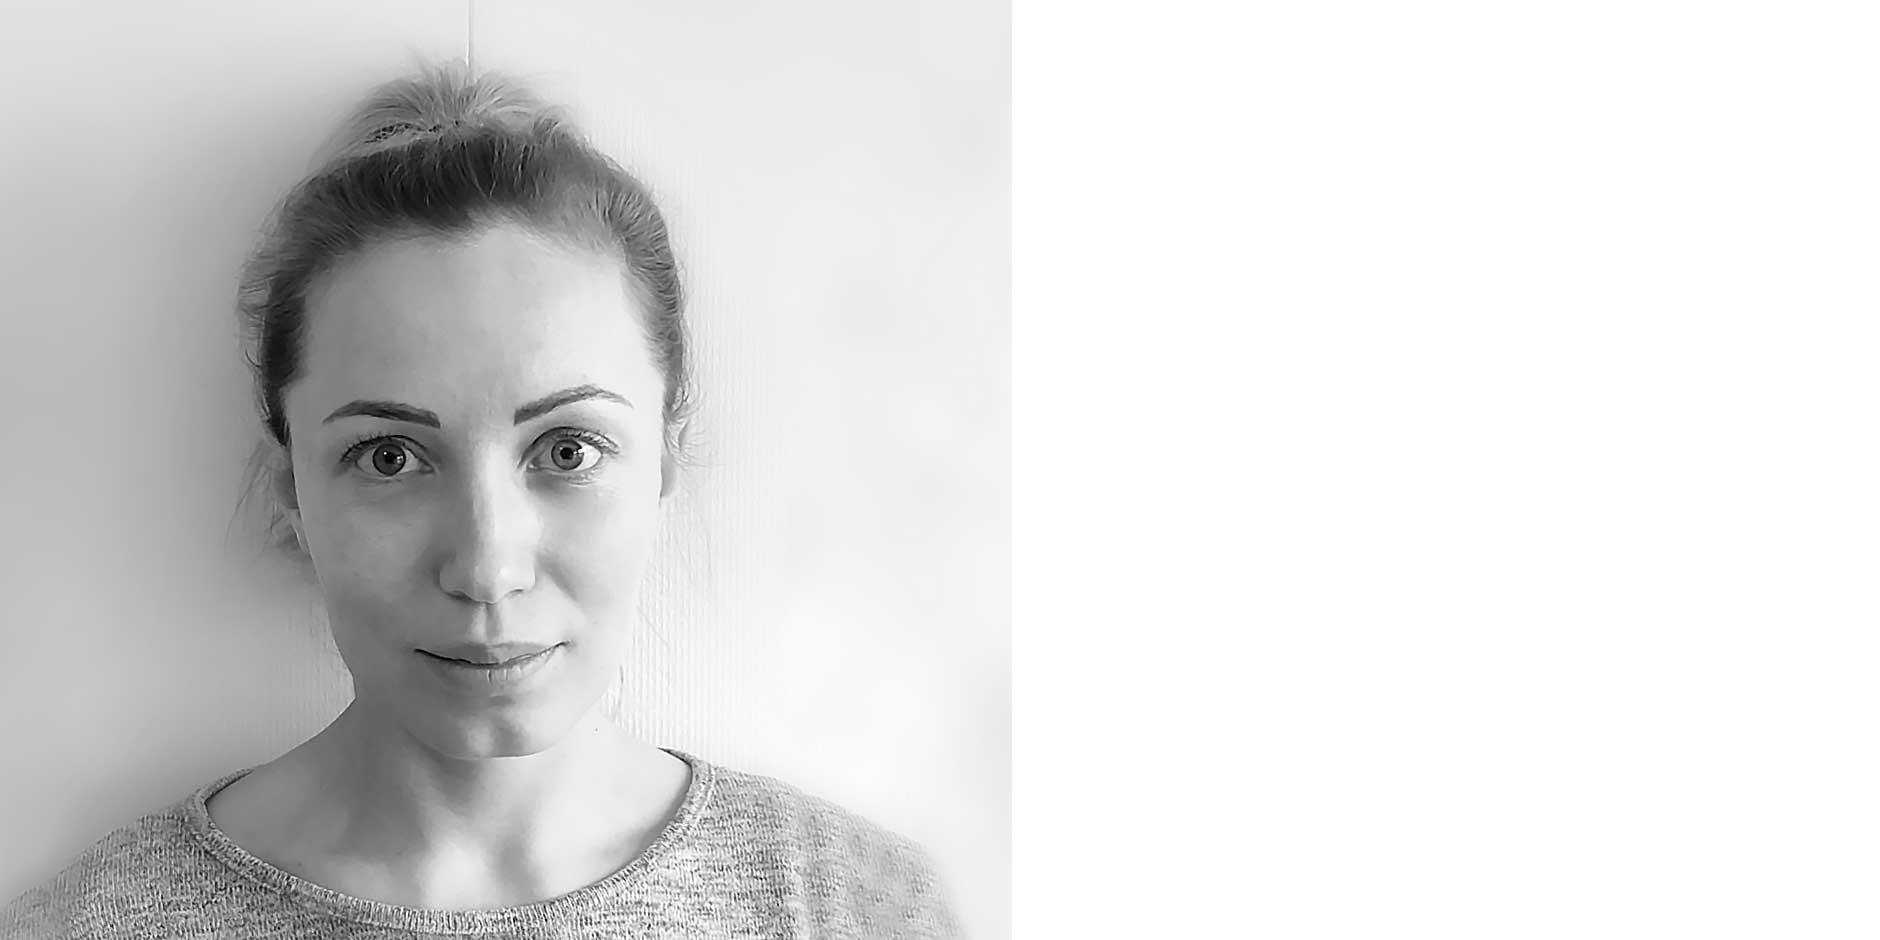 Natalia-Ignatowicz-bilde-4.jpg